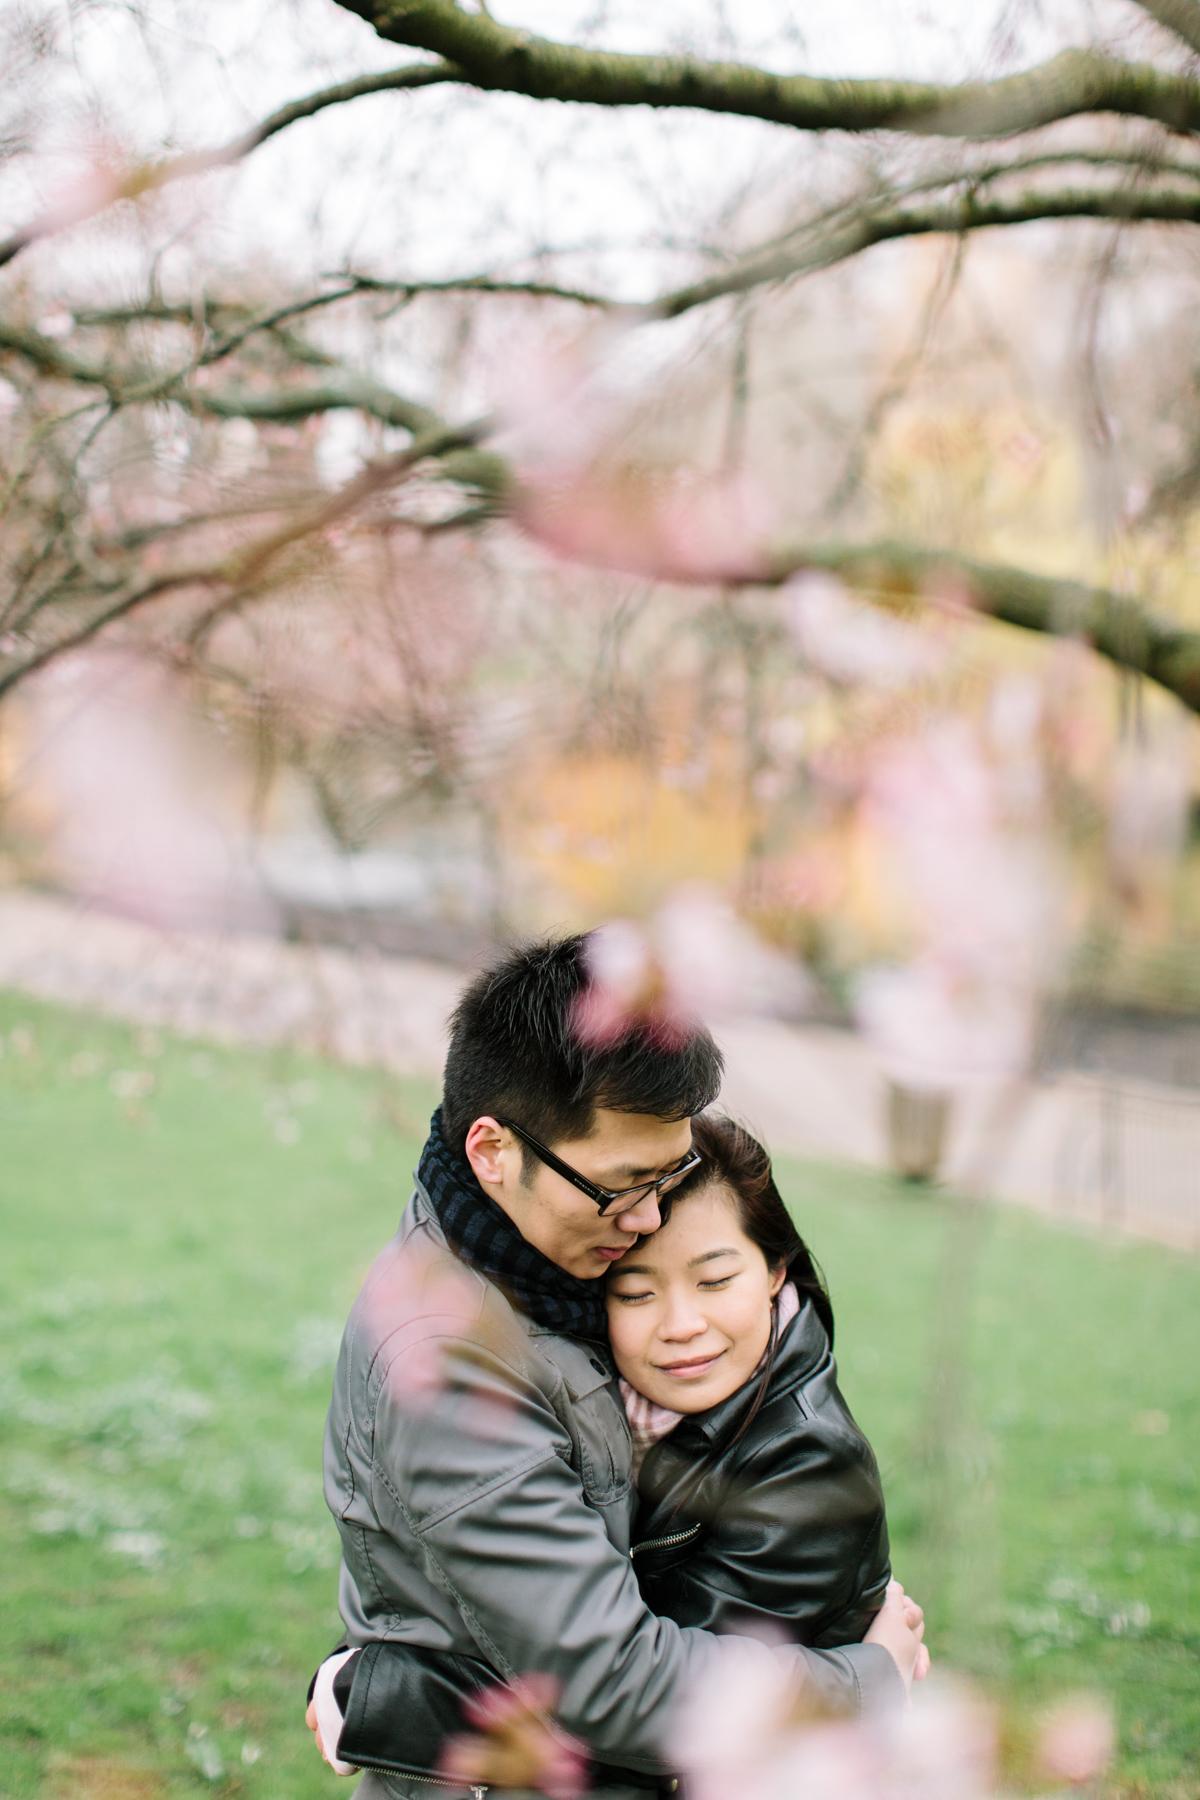 joeewong-ceja-london-uk-engagement-05